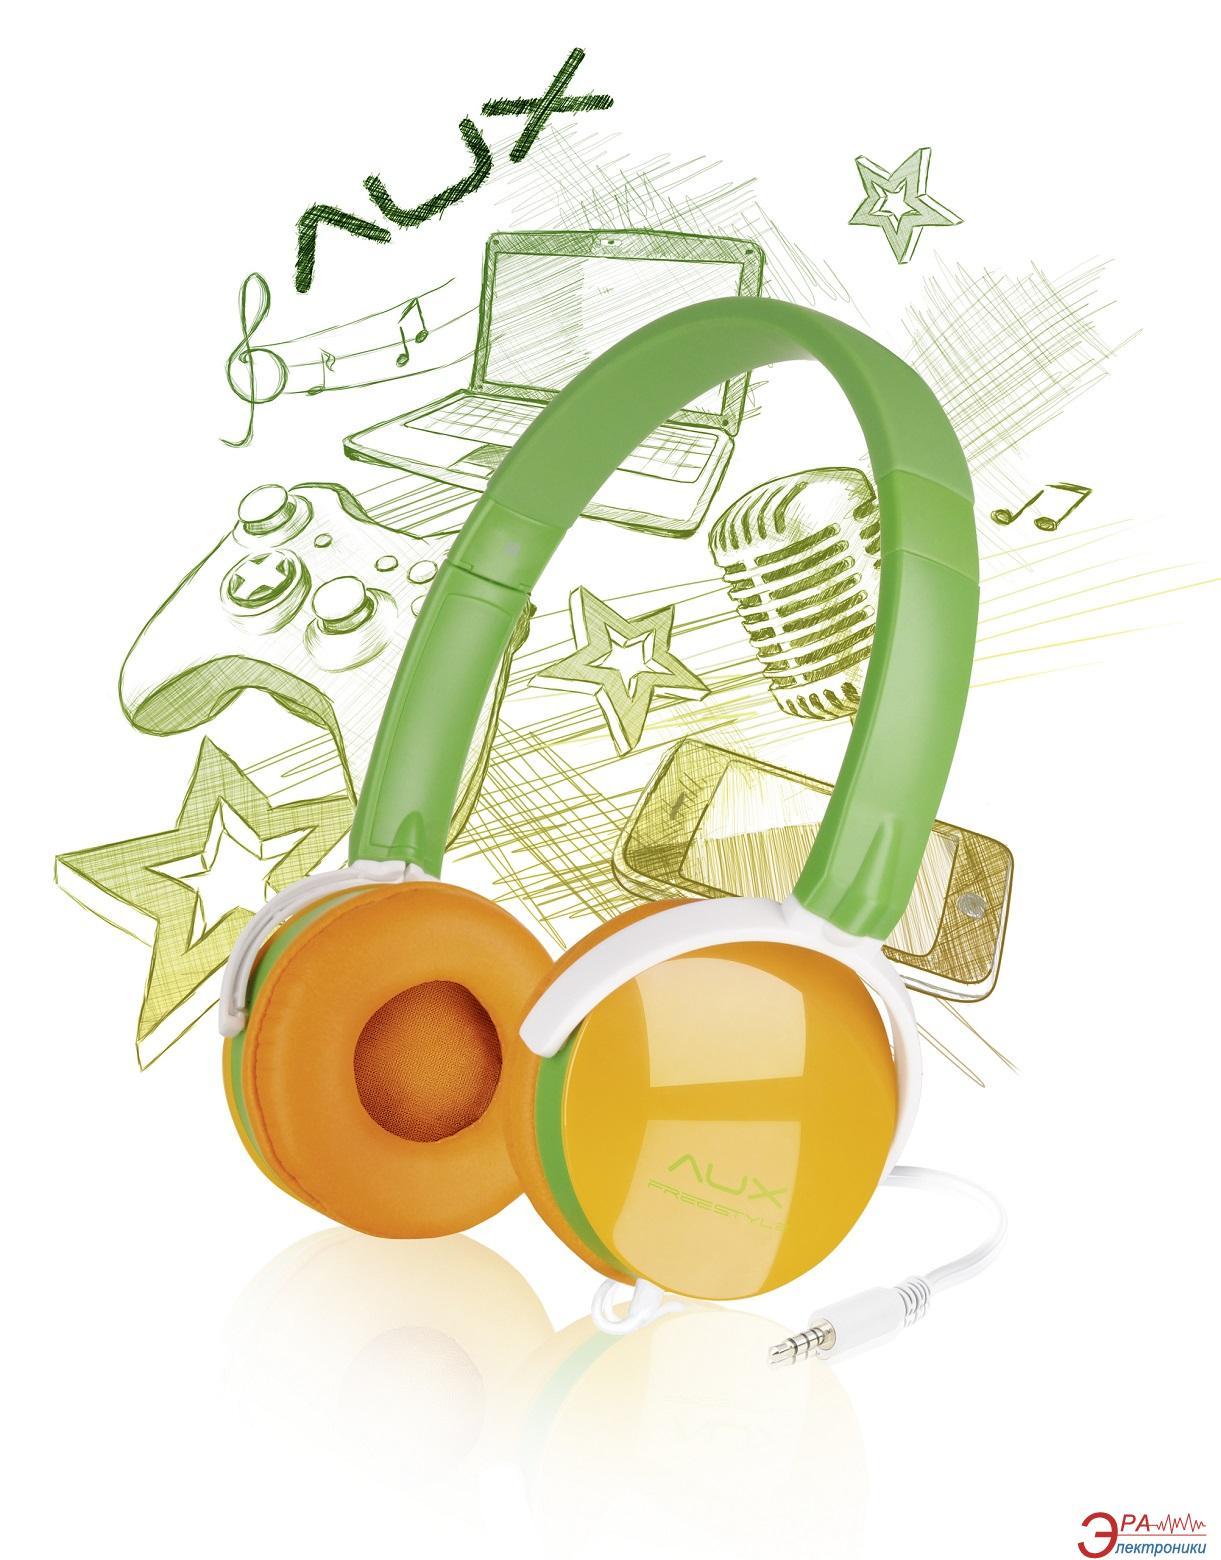 Гарнитура Speed Link Aux - Ffreestyle Stereo Headset Green-Orange (SL-8752-GNOE)